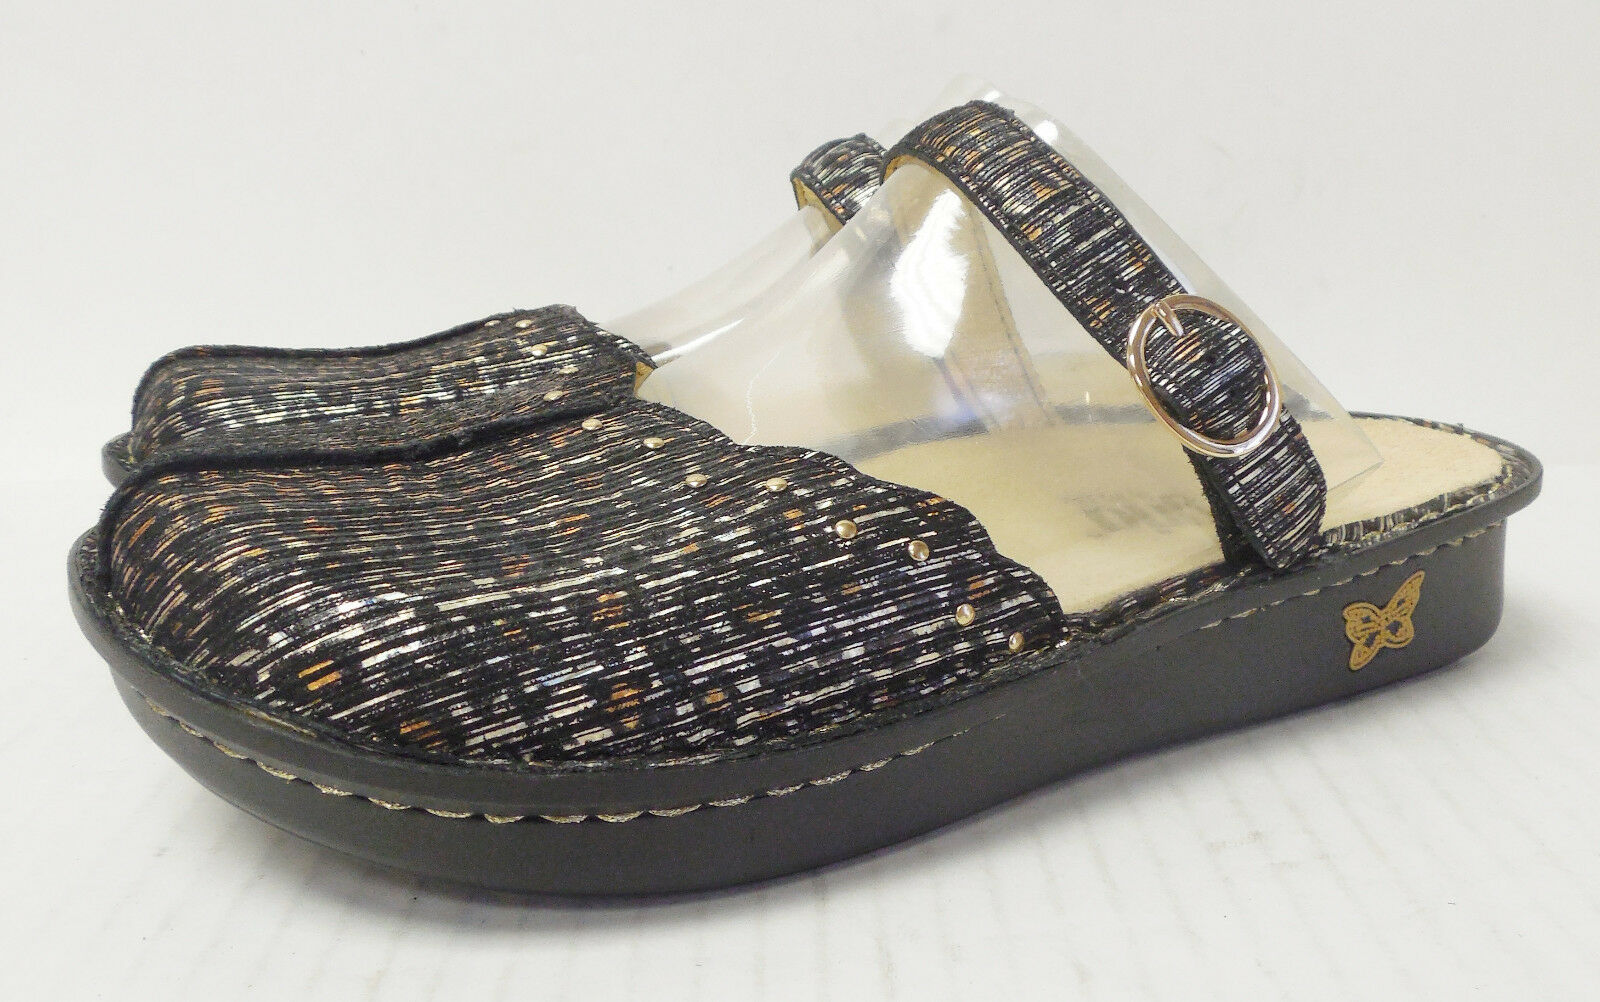 D494 New Women's Alegria Tuscany Leopard Stripe Sandal US 5 5.5  W